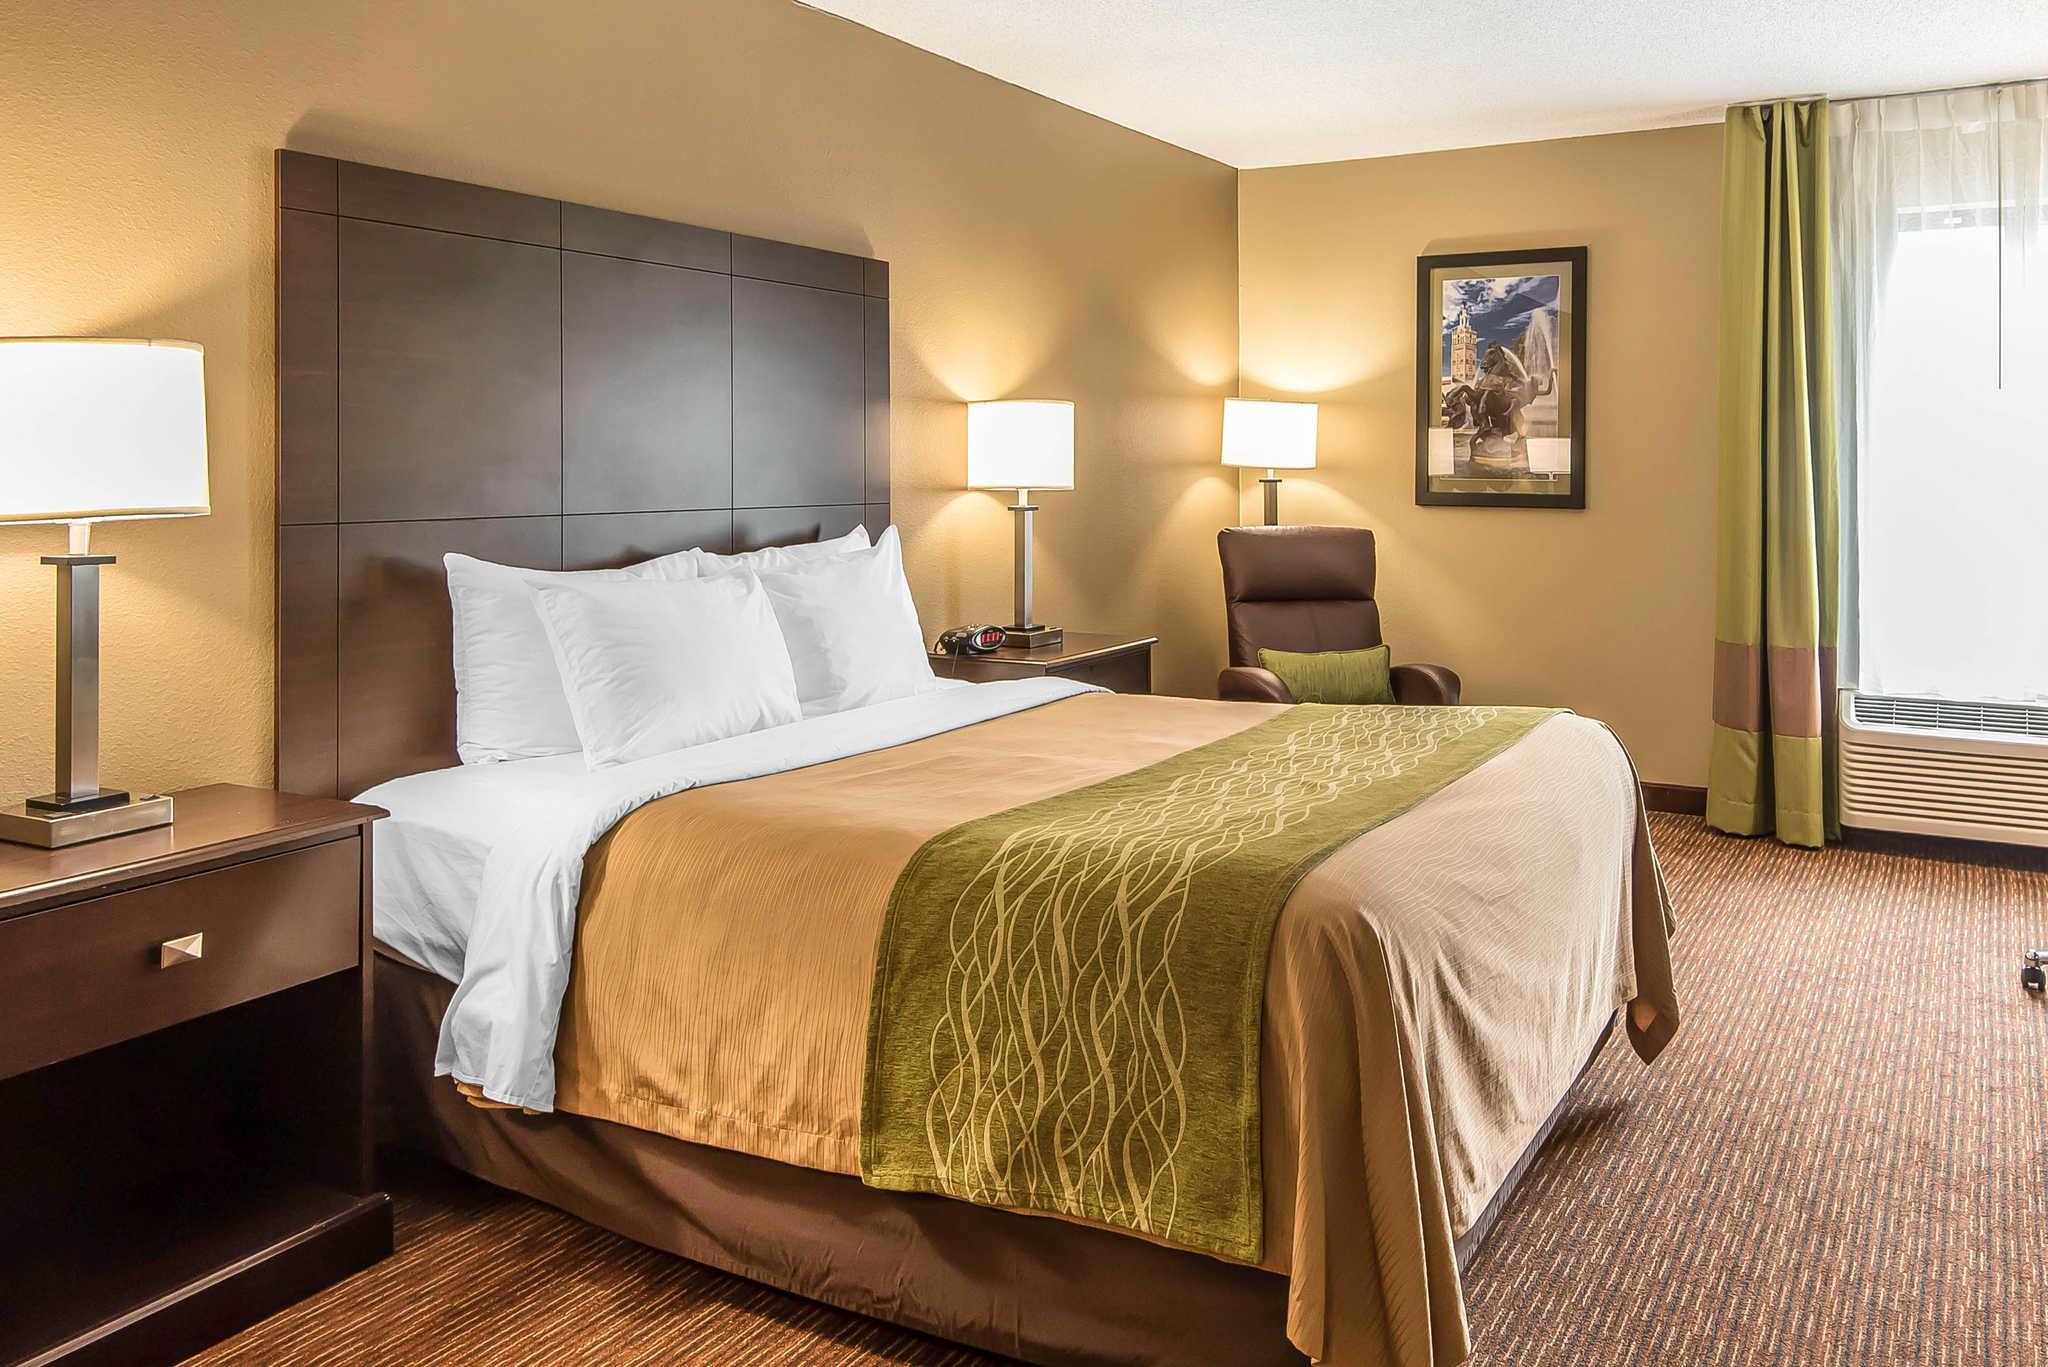 Comfort Inn & Suites Kansas City - Northeast image 10